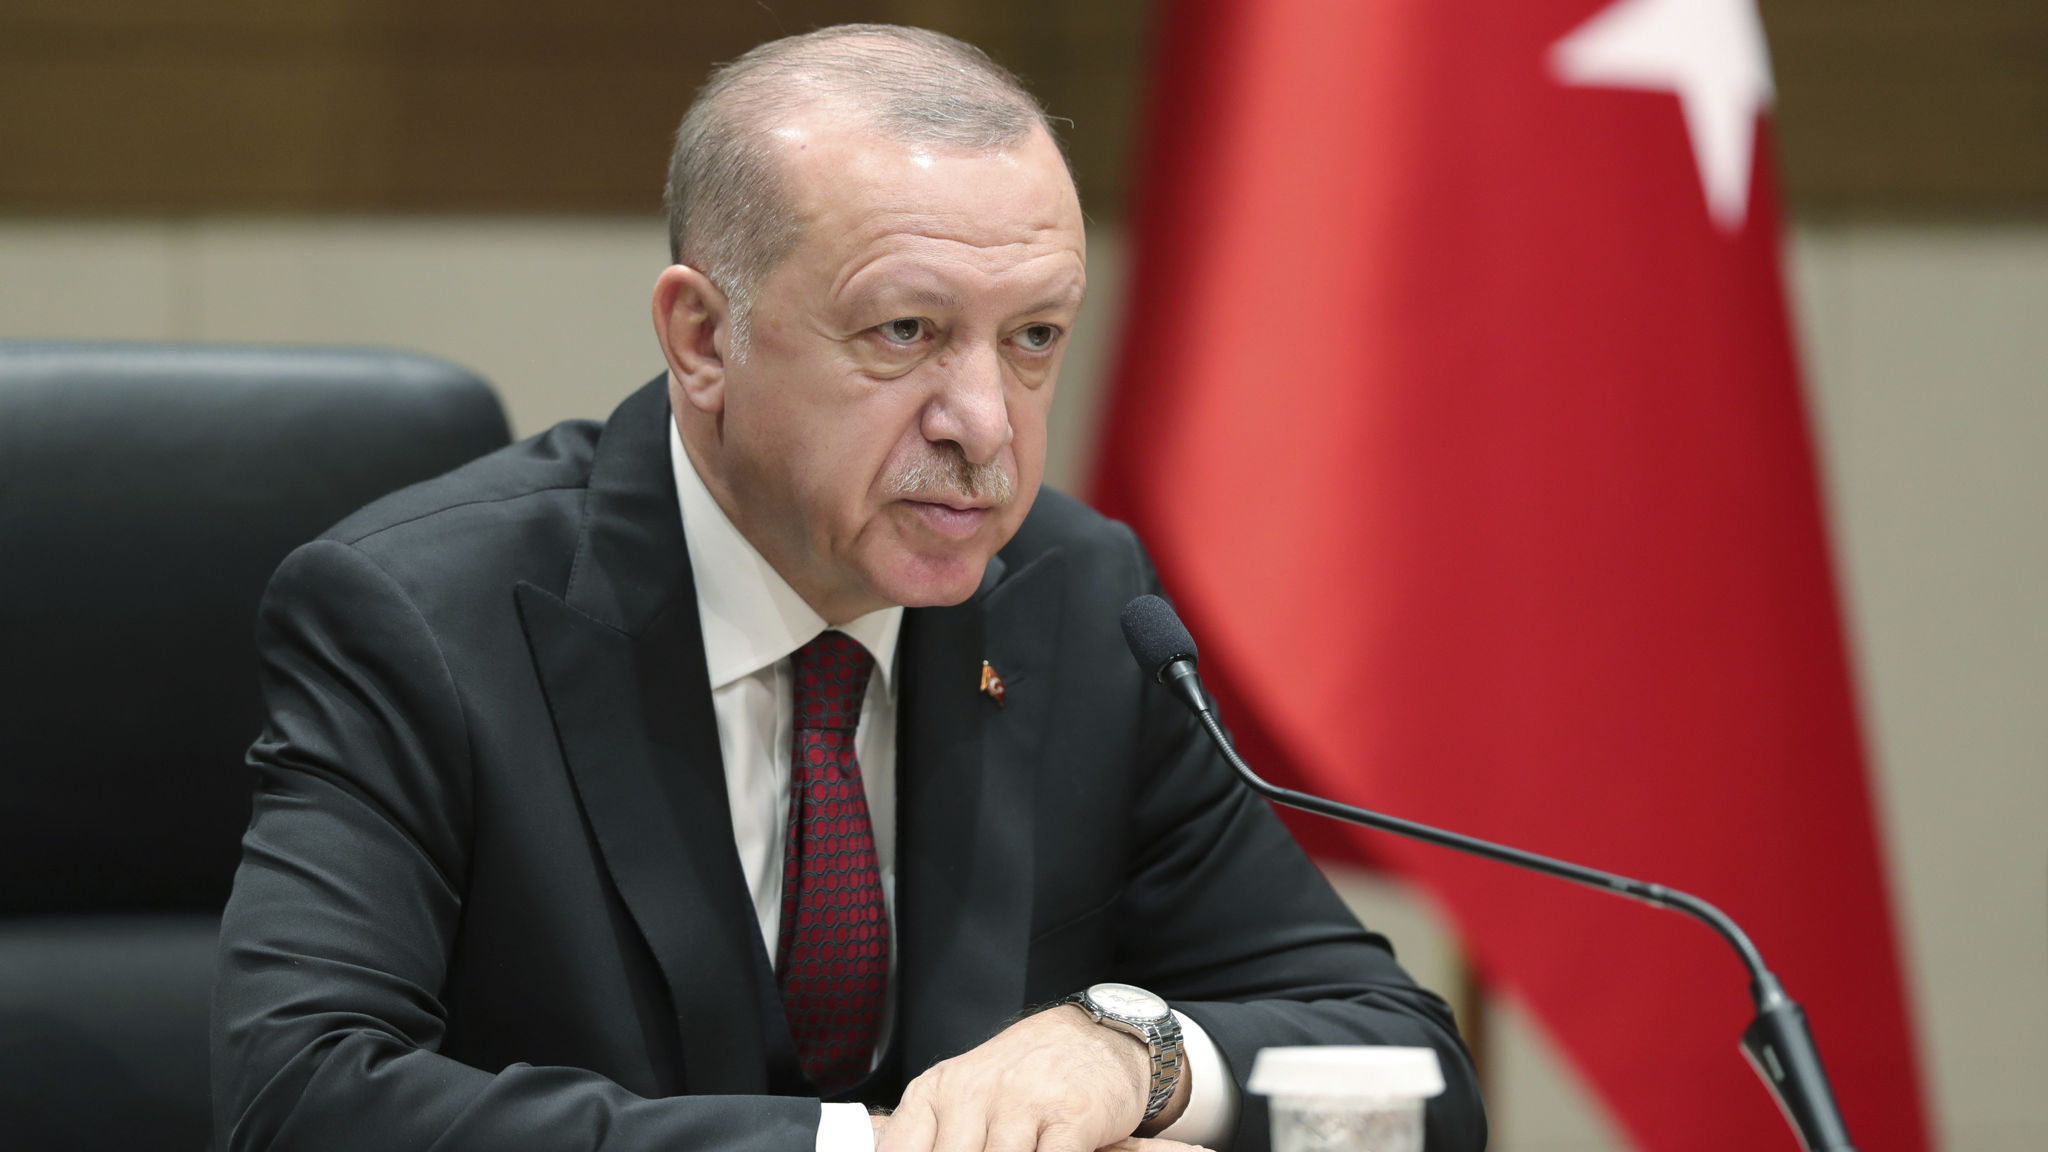 Recep Tayyip Erdoğan - 2048x1152 Wallpaper - teahub.io